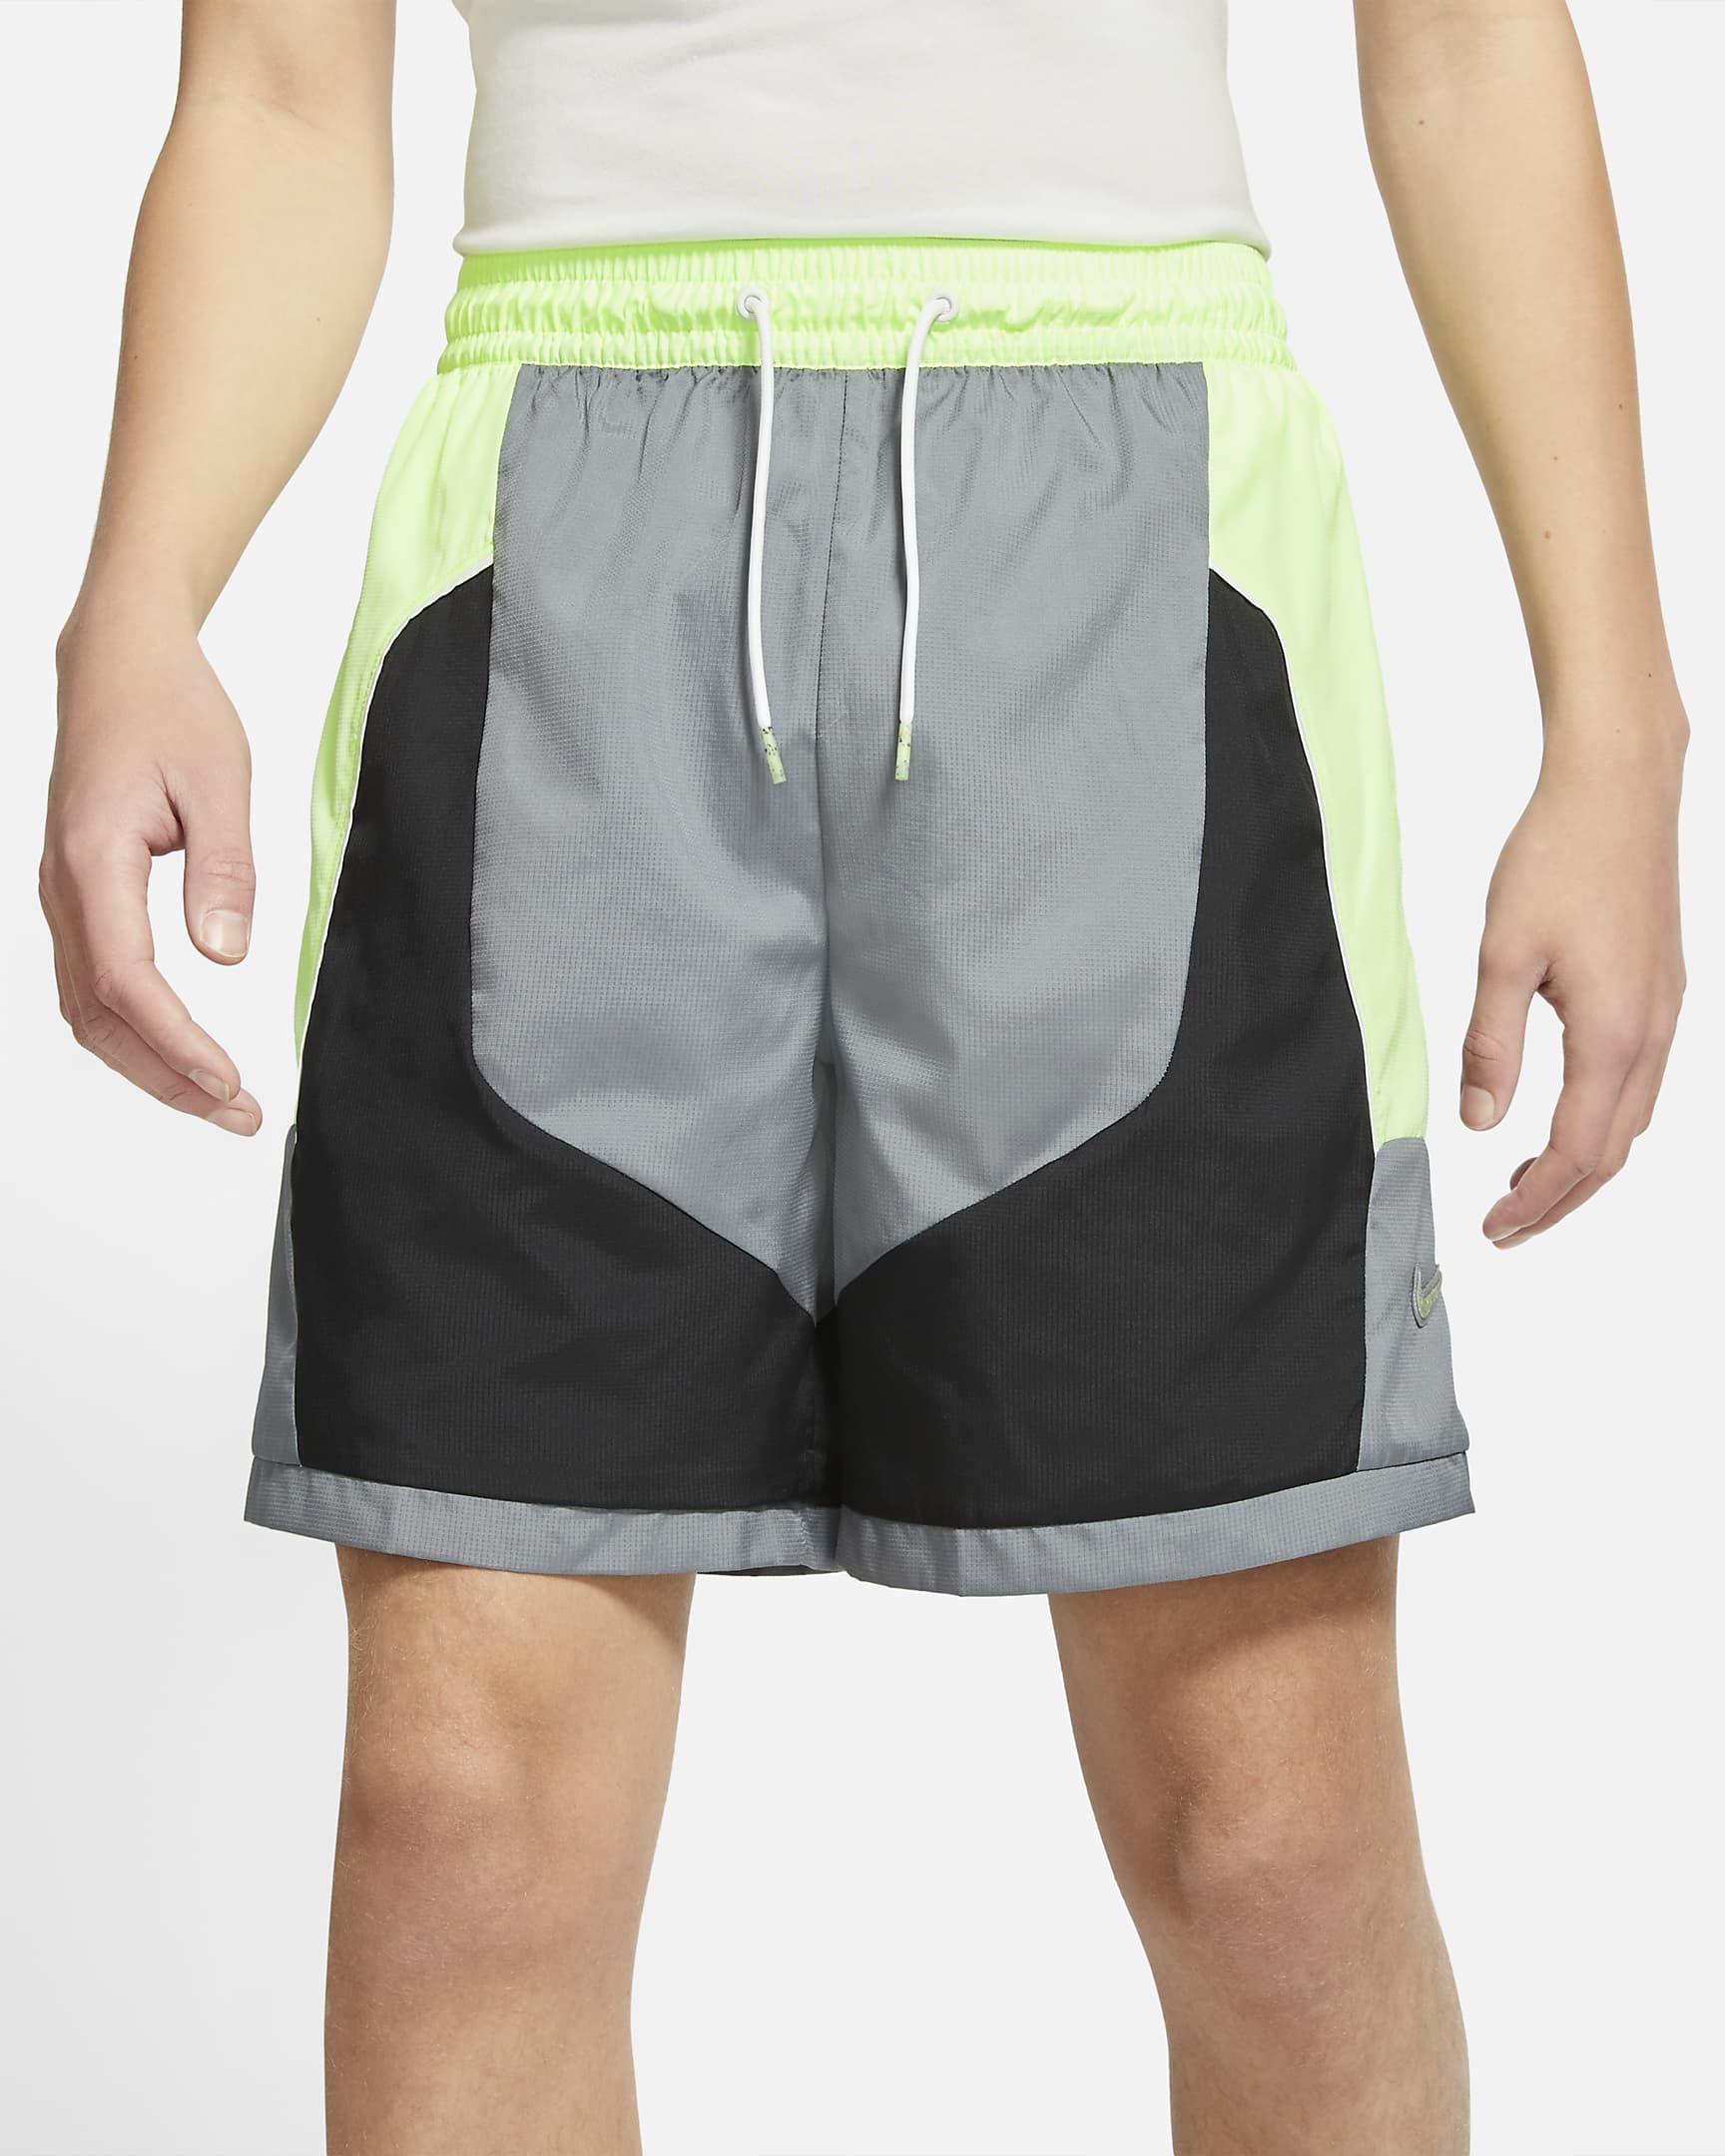 throwback-mens-basketball-shorts-D2s5Rs-1